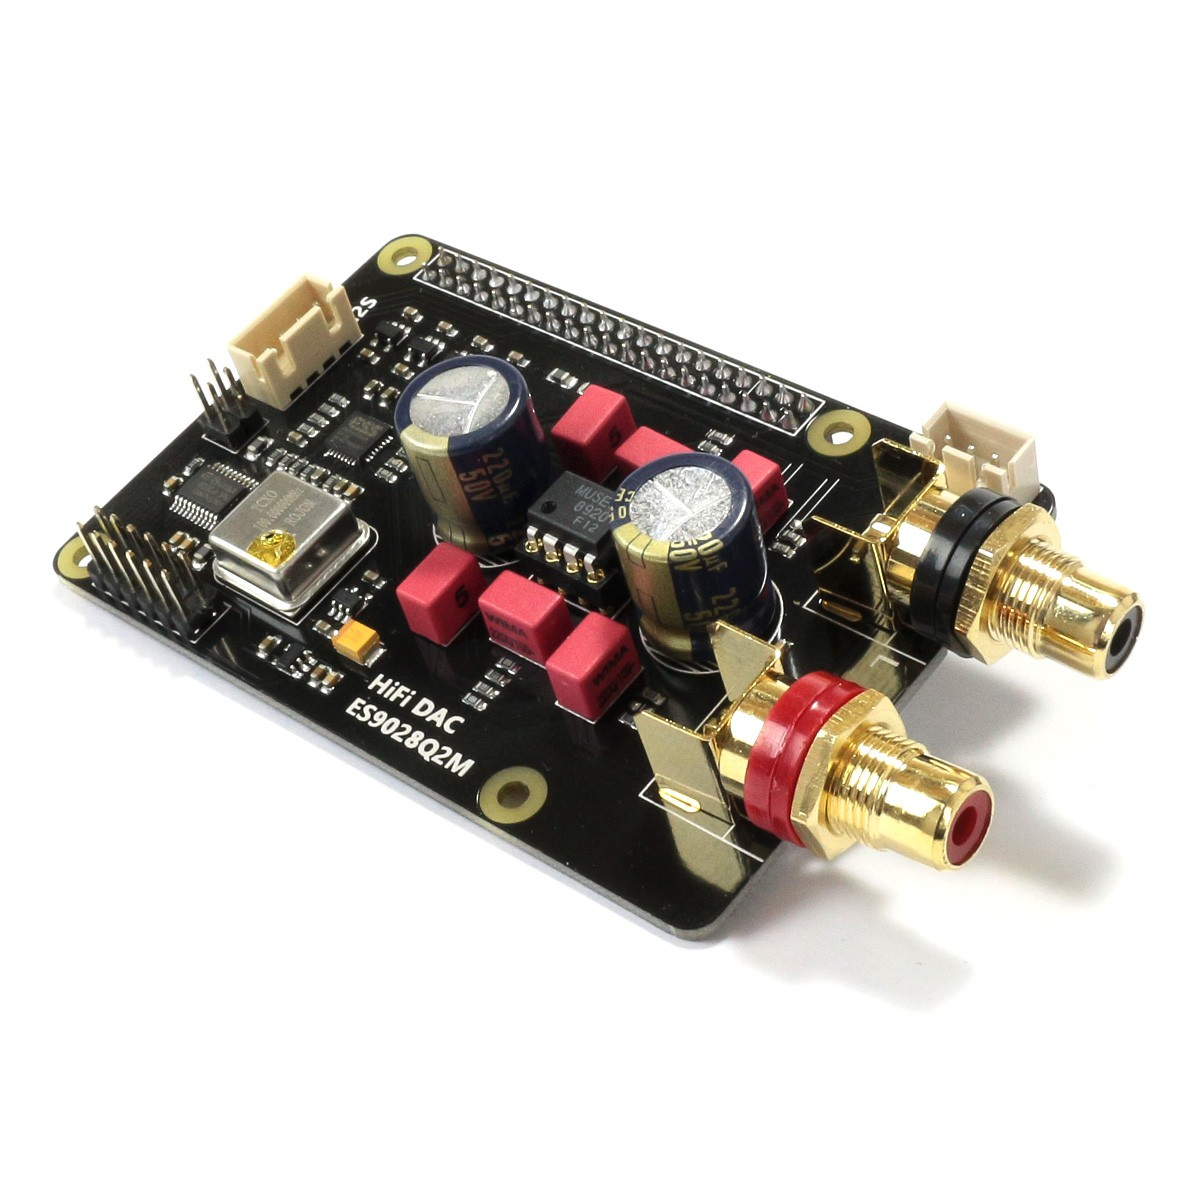 SUPTRONICS X20-DAC Module DAC I2S RCA ES9028Q2M 32bit 384kHz 1x AOP NJR MUSES 8920